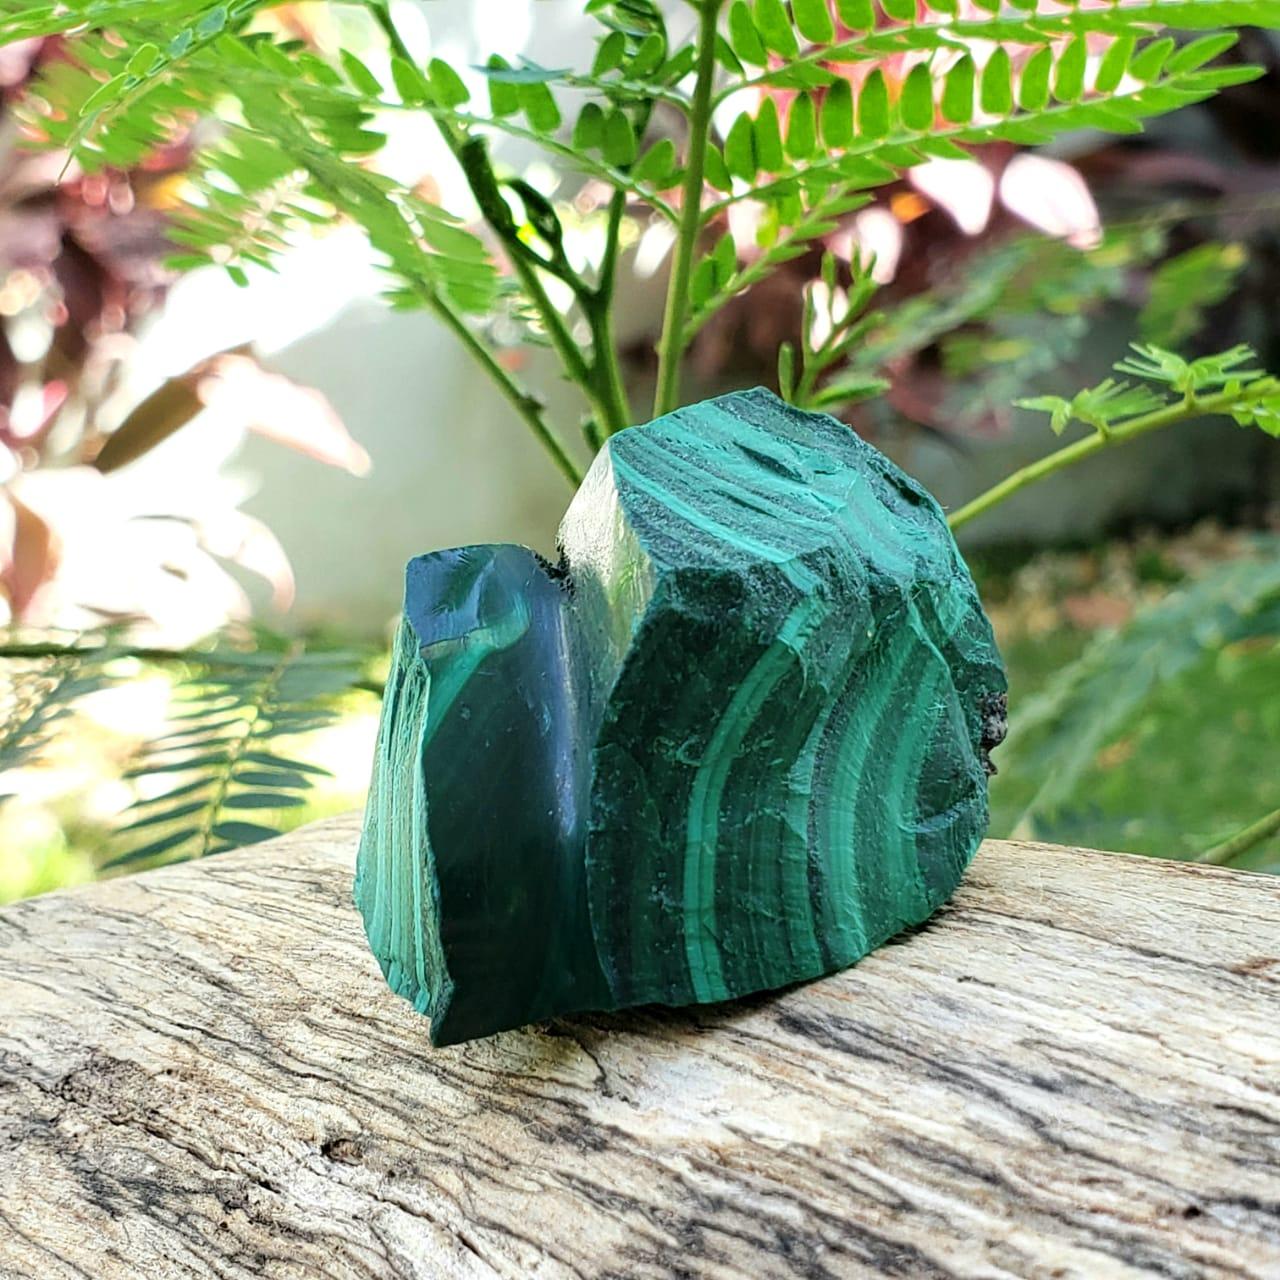 Cristal - Pedra Bruta - Malaquita - Equilíbrio e Harmonia